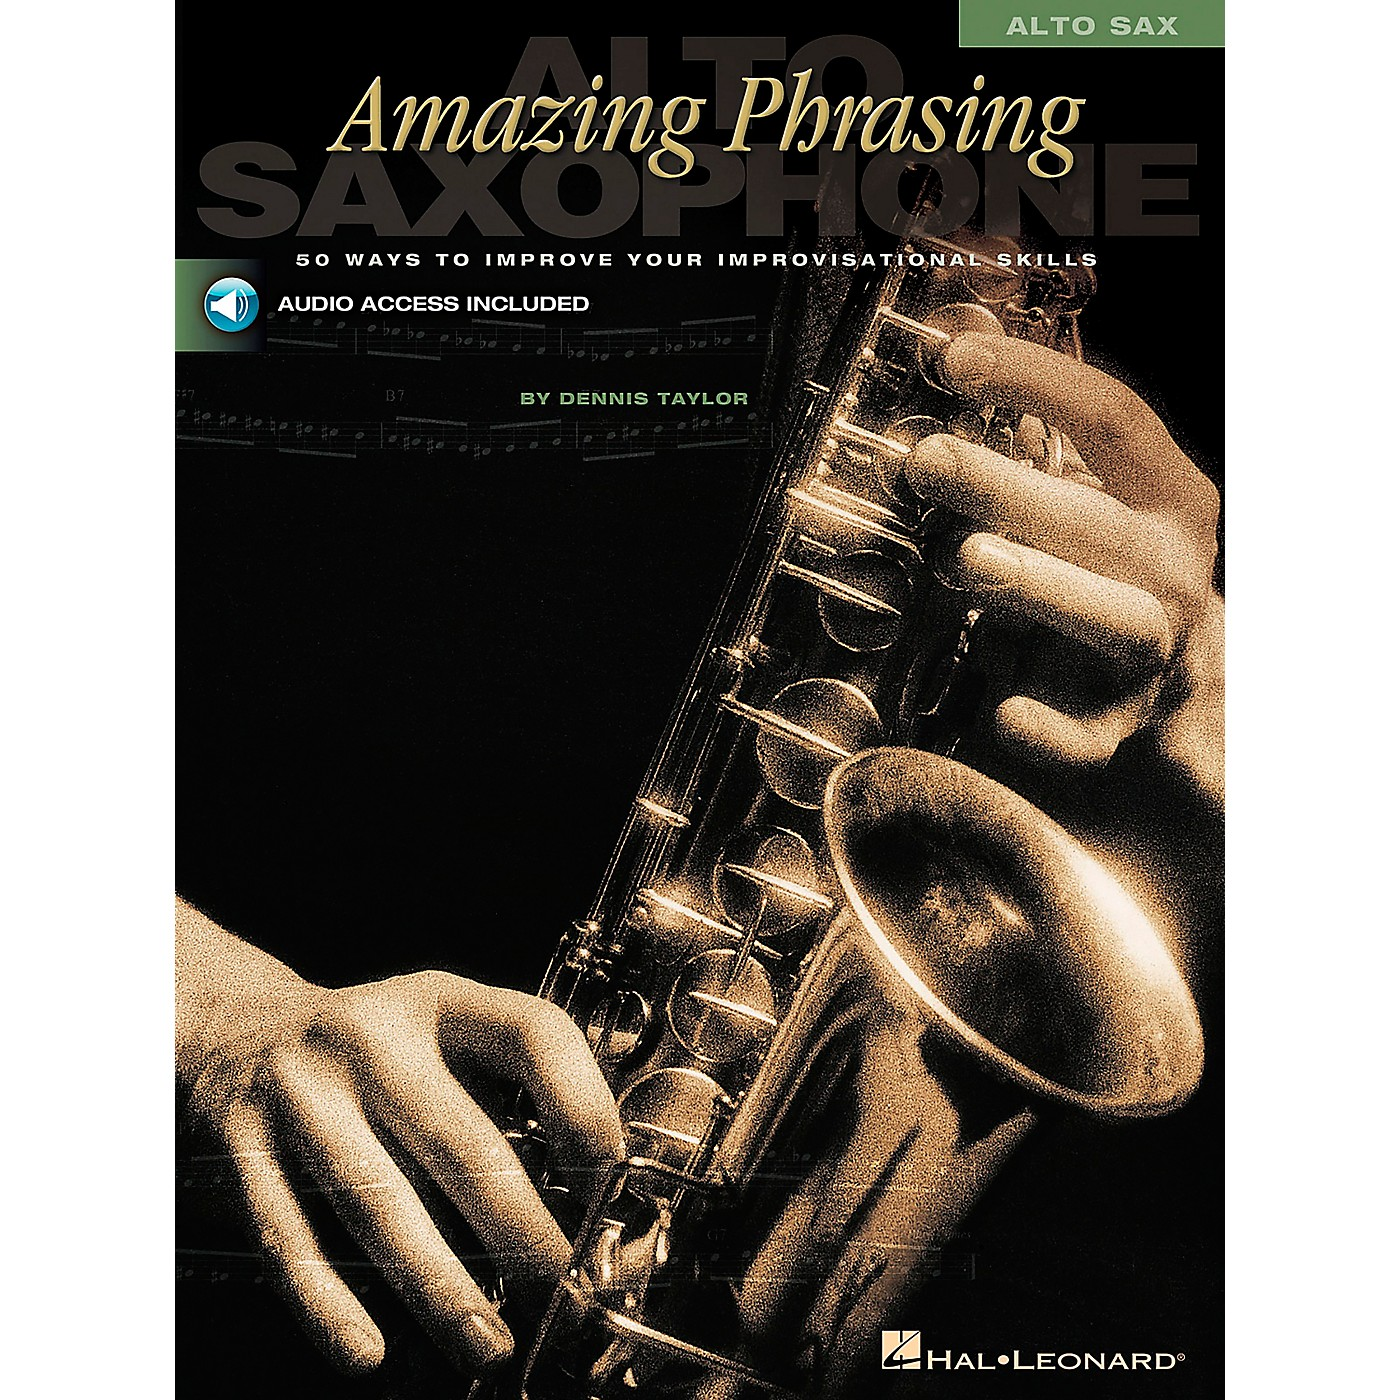 Hal Leonard Amazing Phrasing - Alto Sax (Book/Online Audio) thumbnail